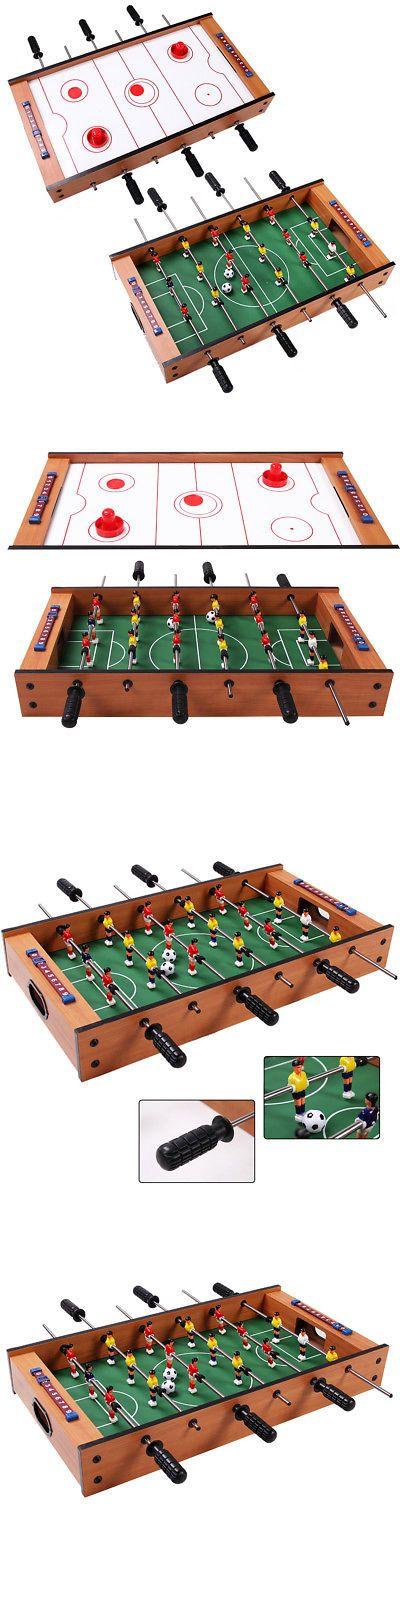 Foosball 36276: 2 In 1 Table Game Air Hockey Foosball Table Christmas Gift  For Kids